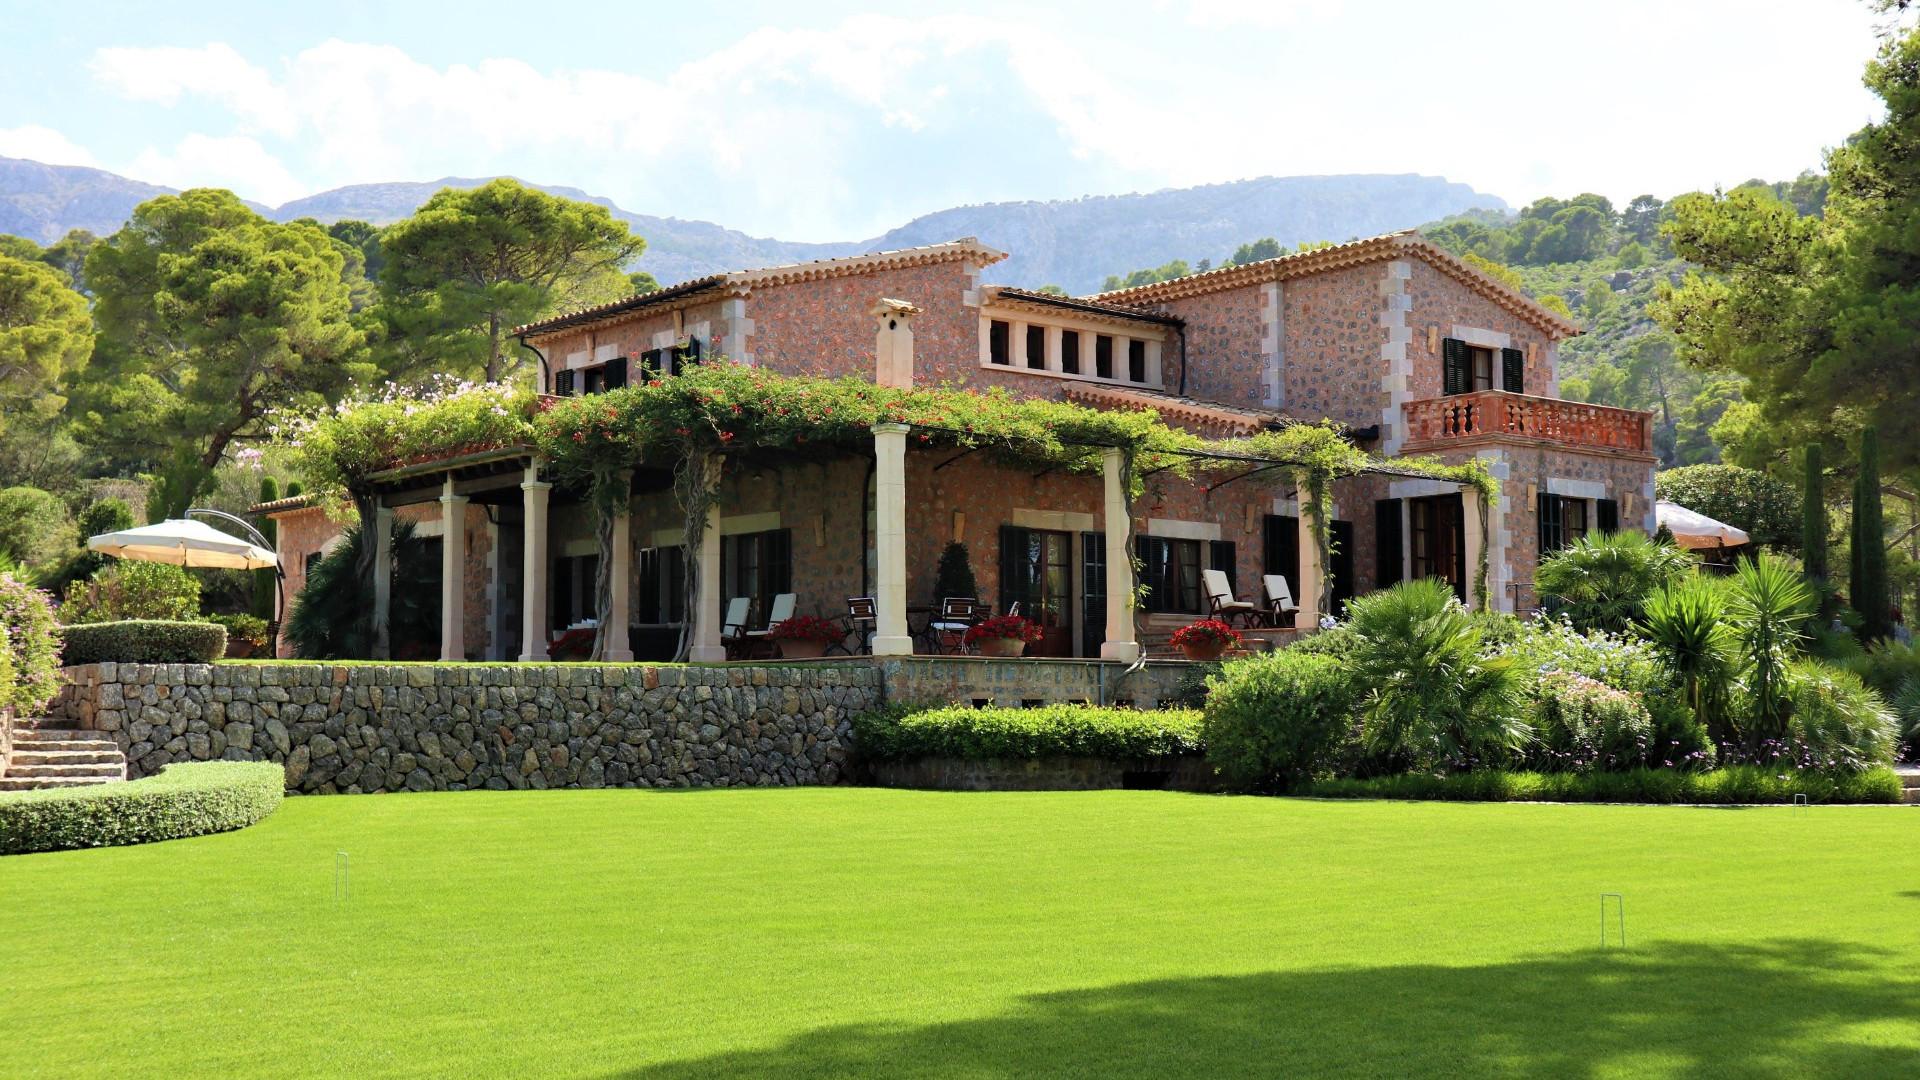 4 Bedroom Villa Deia Large Private Pool & Sea Views - Terrace Area With Large Gardens Mallorca